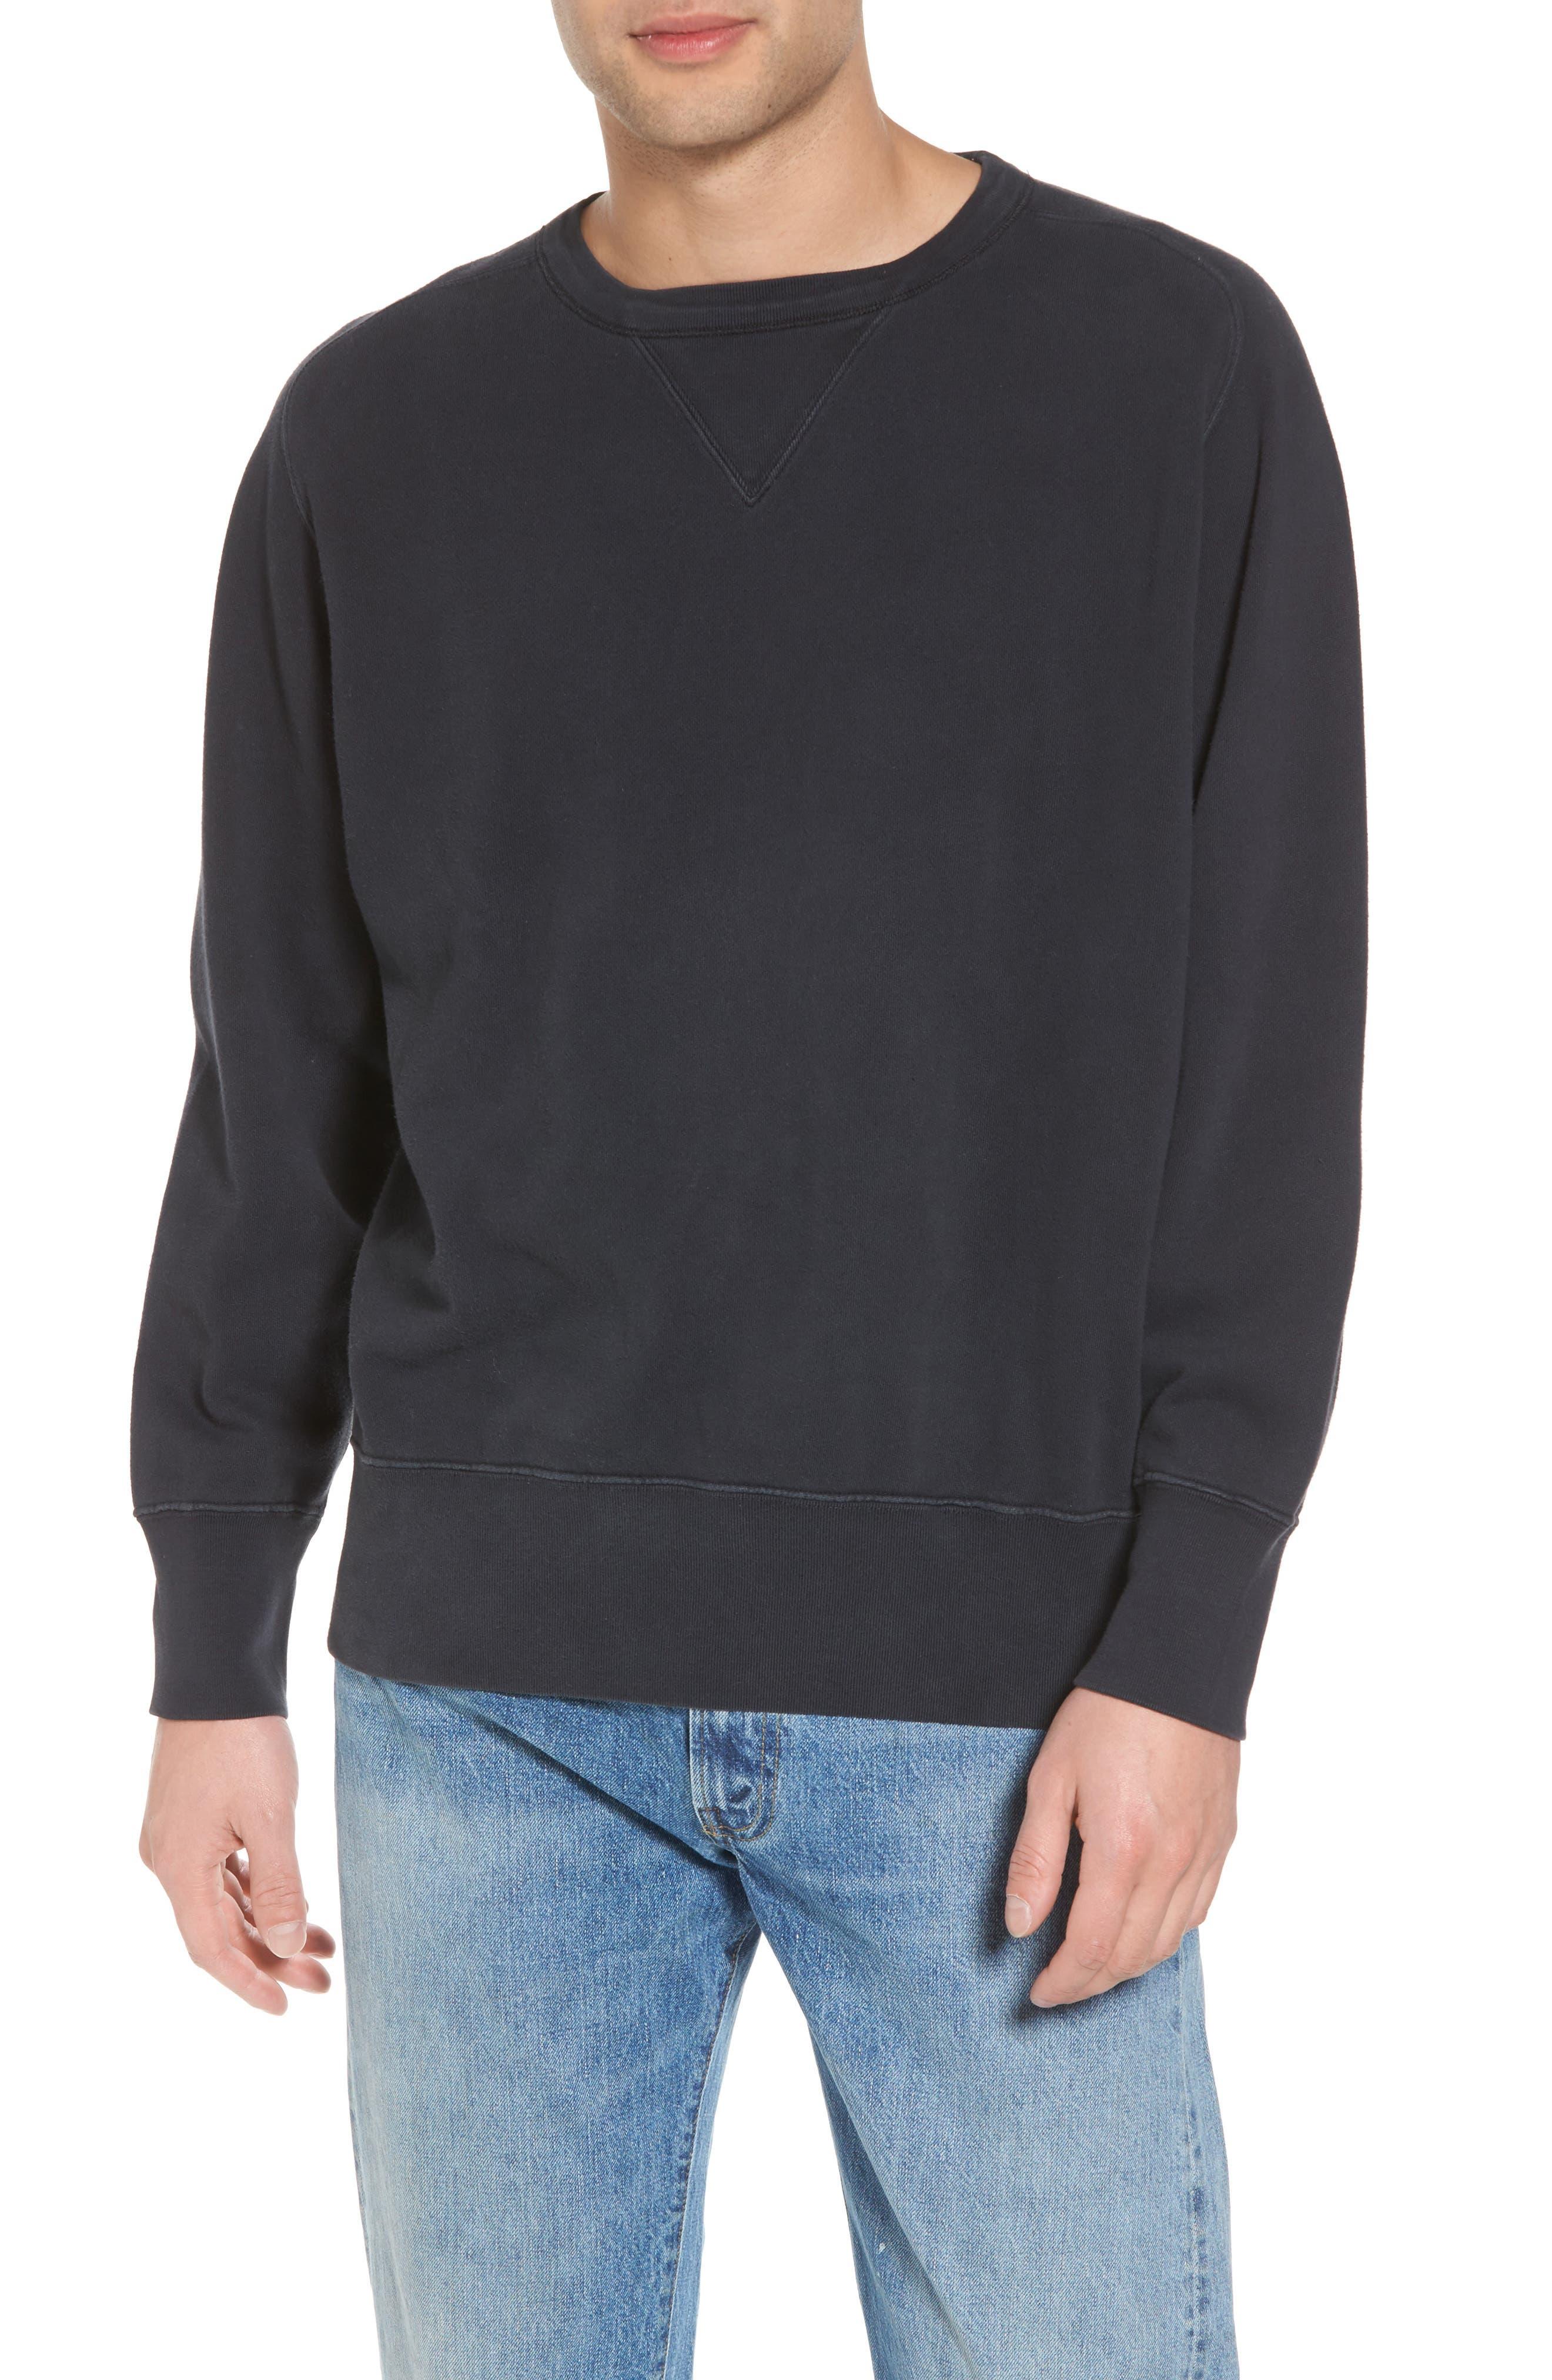 Bay Meadows Sweatshirt,                             Main thumbnail 1, color,                             BLACK